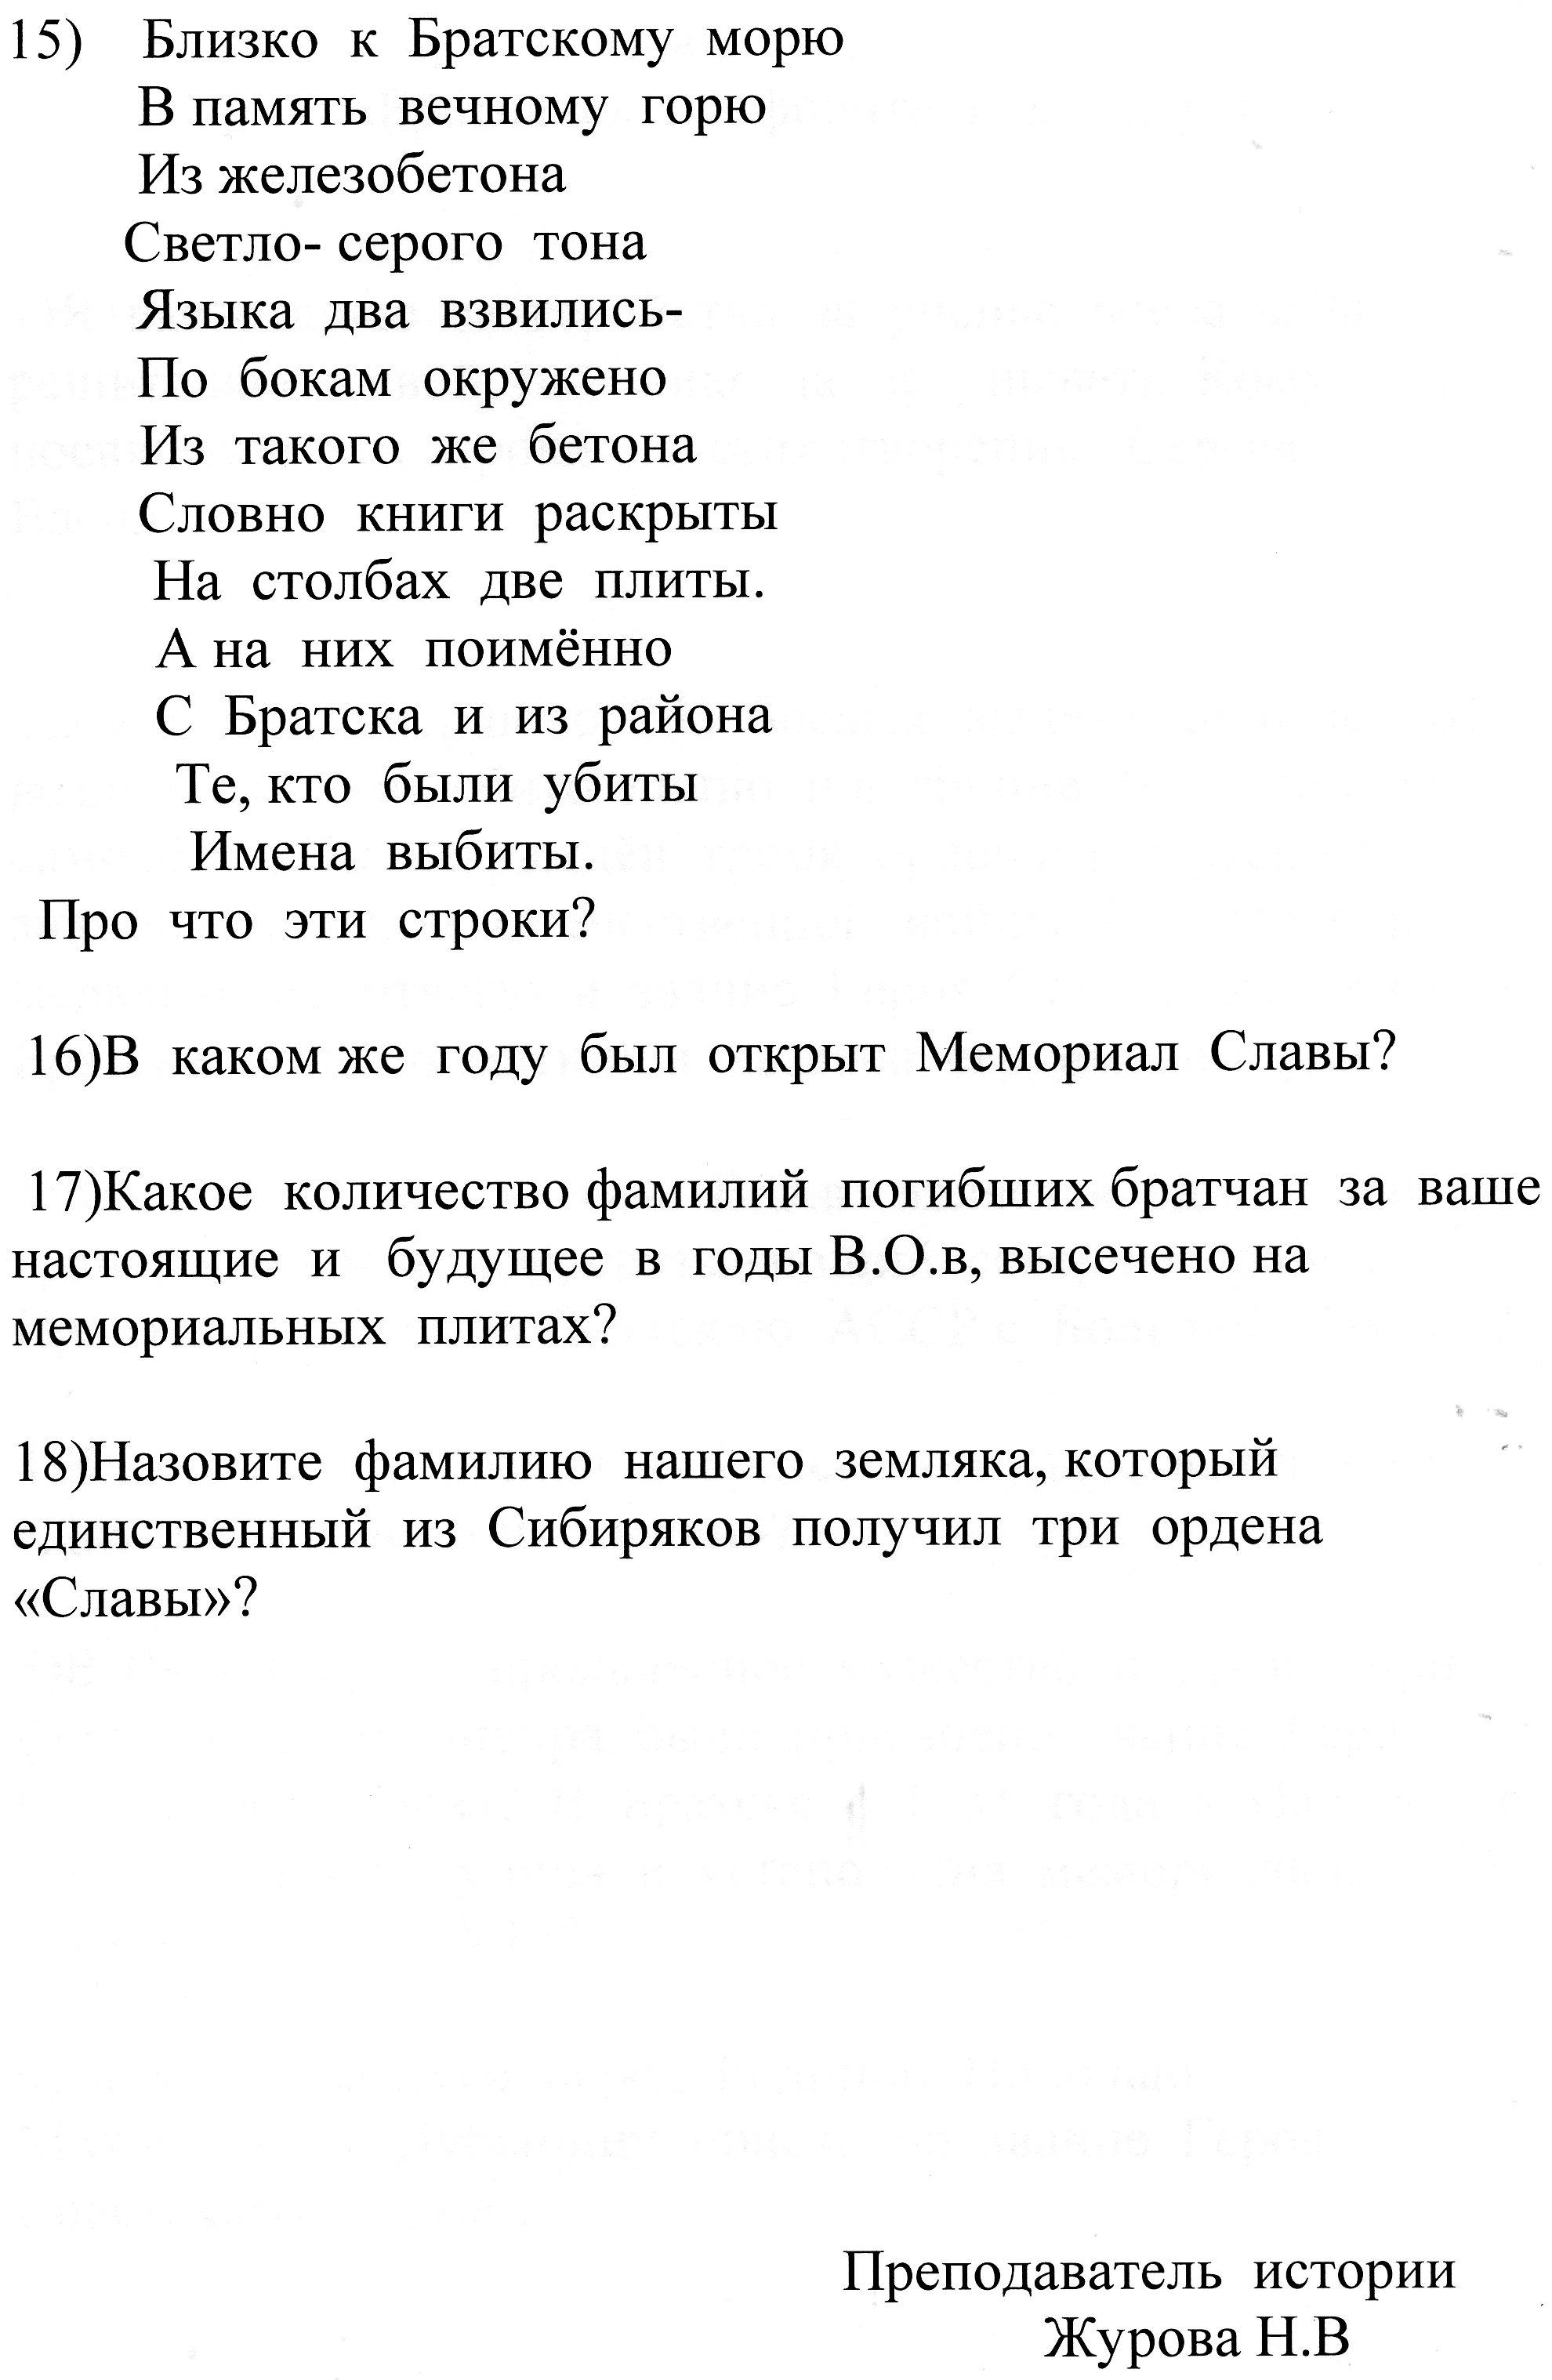 C:\Users\Ульяна\Pictures\скан474.jpg